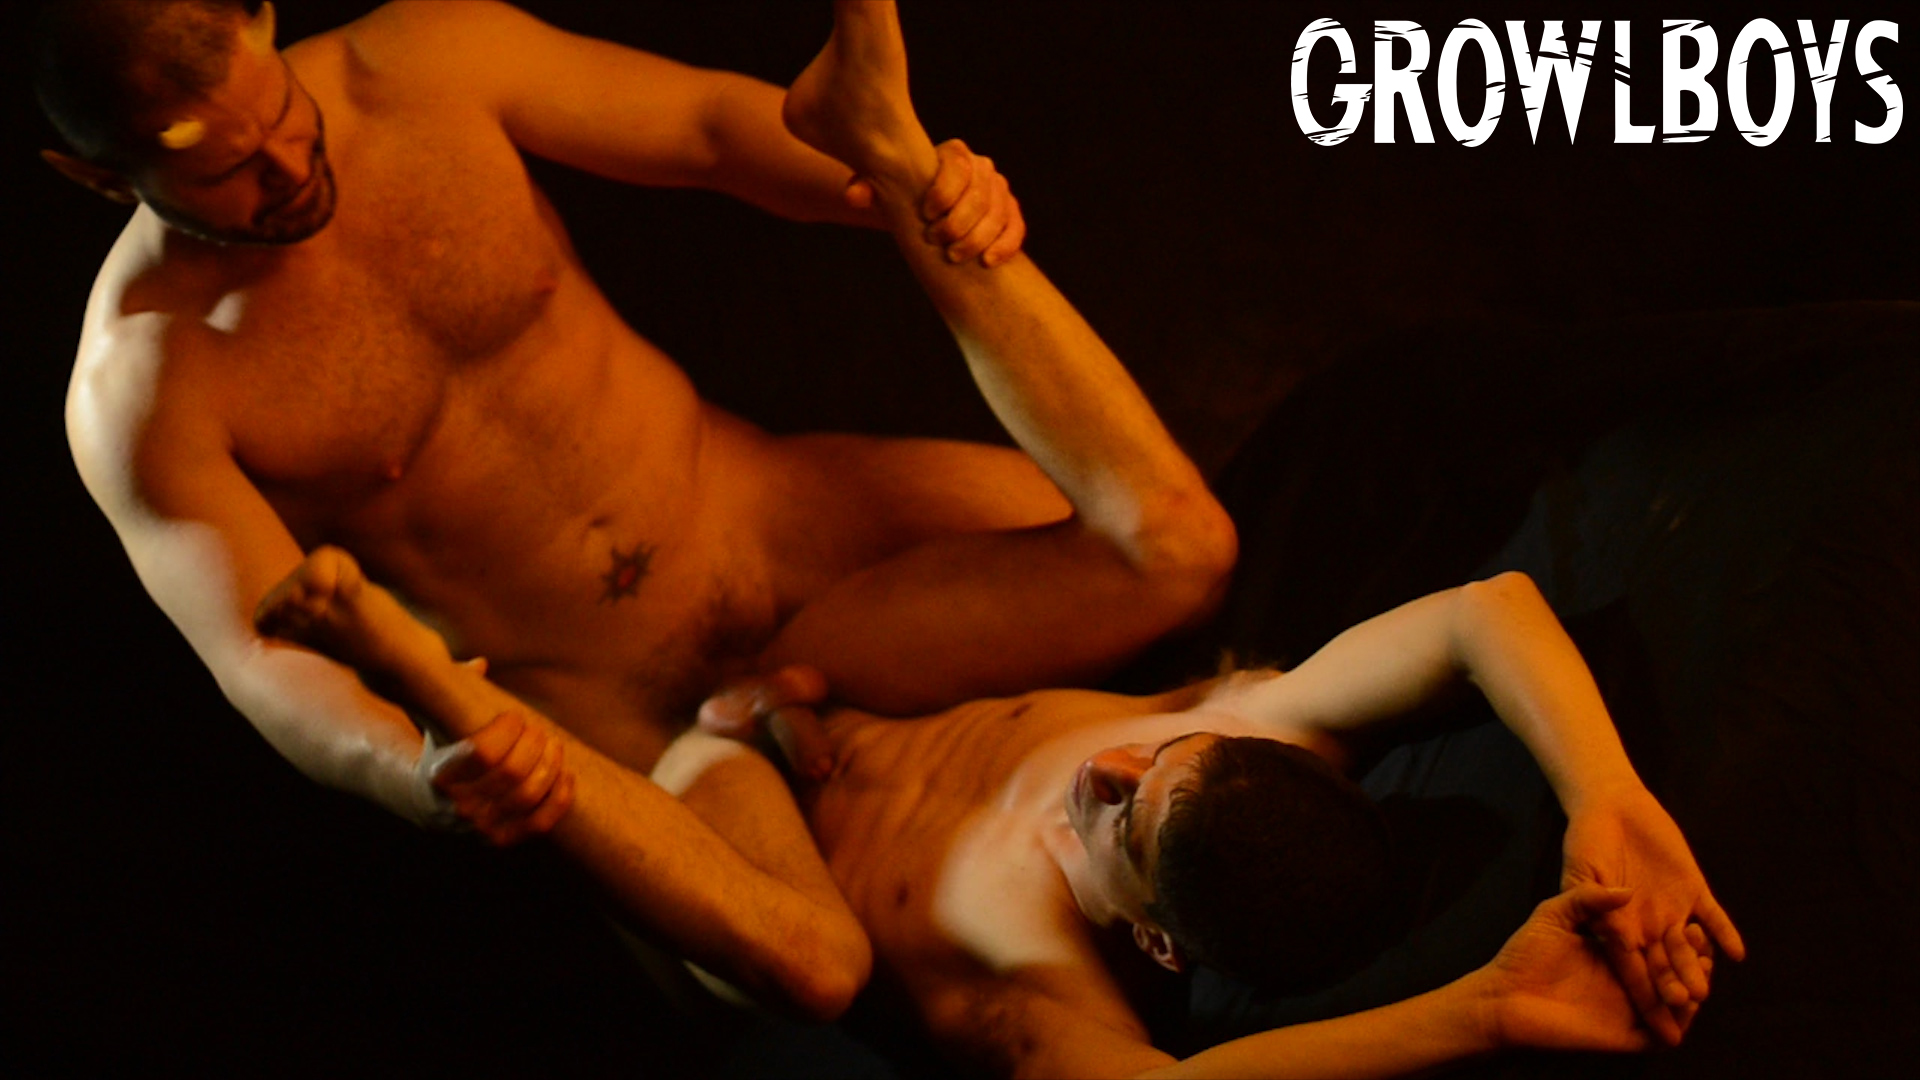 Air Porn One pan's cave | growlboys gay transformation porn